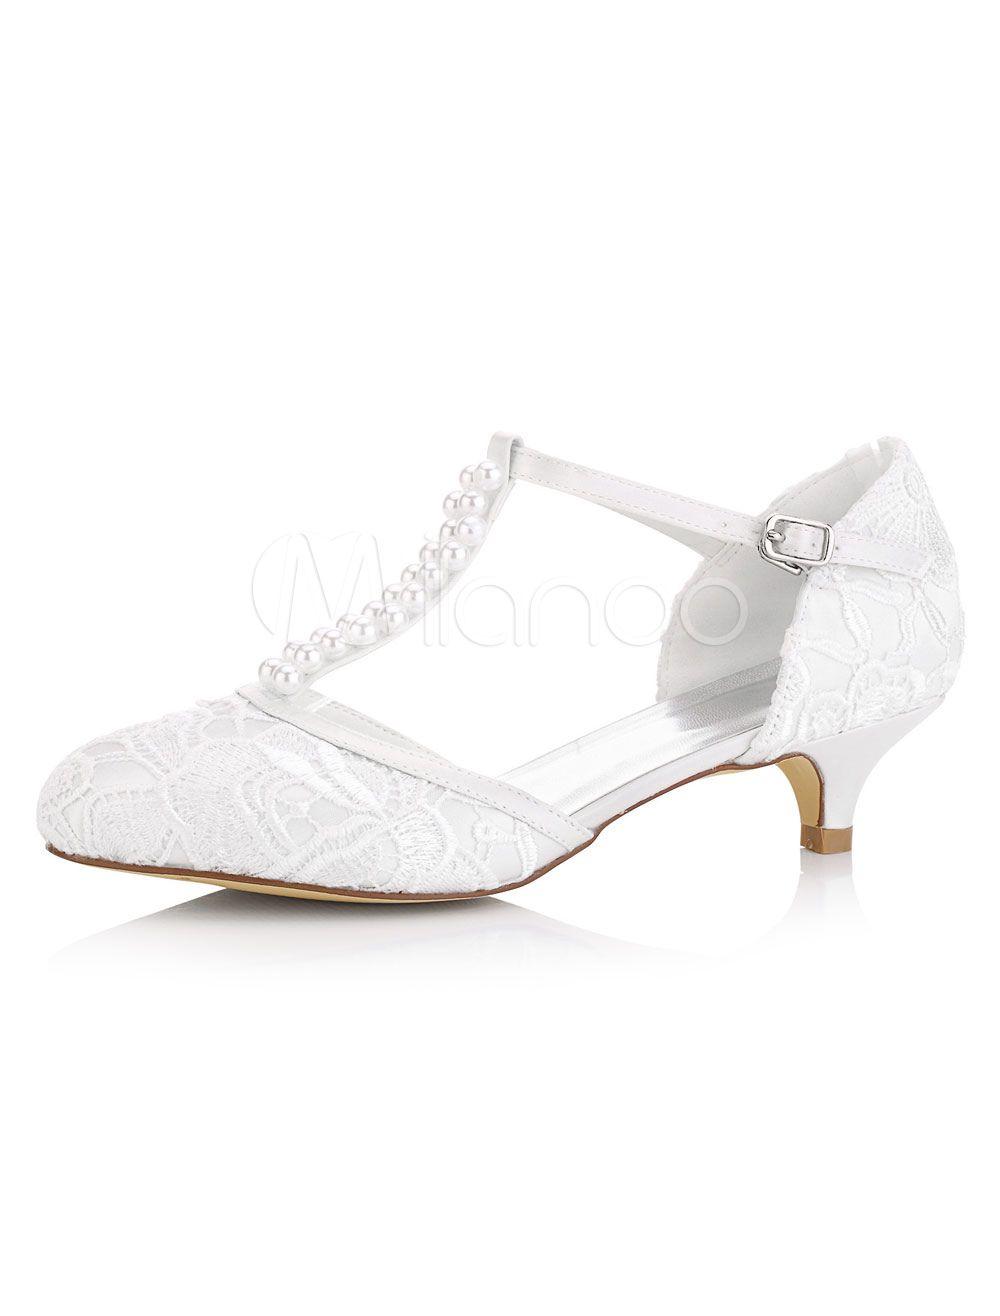 White Wedding Shoes Kitten Heel Pearls Satin T Type Bridal Shoes Vintage Shoes Kitten Heel Shoes Vintage Shoes Kitten Heel Wedding Shoes